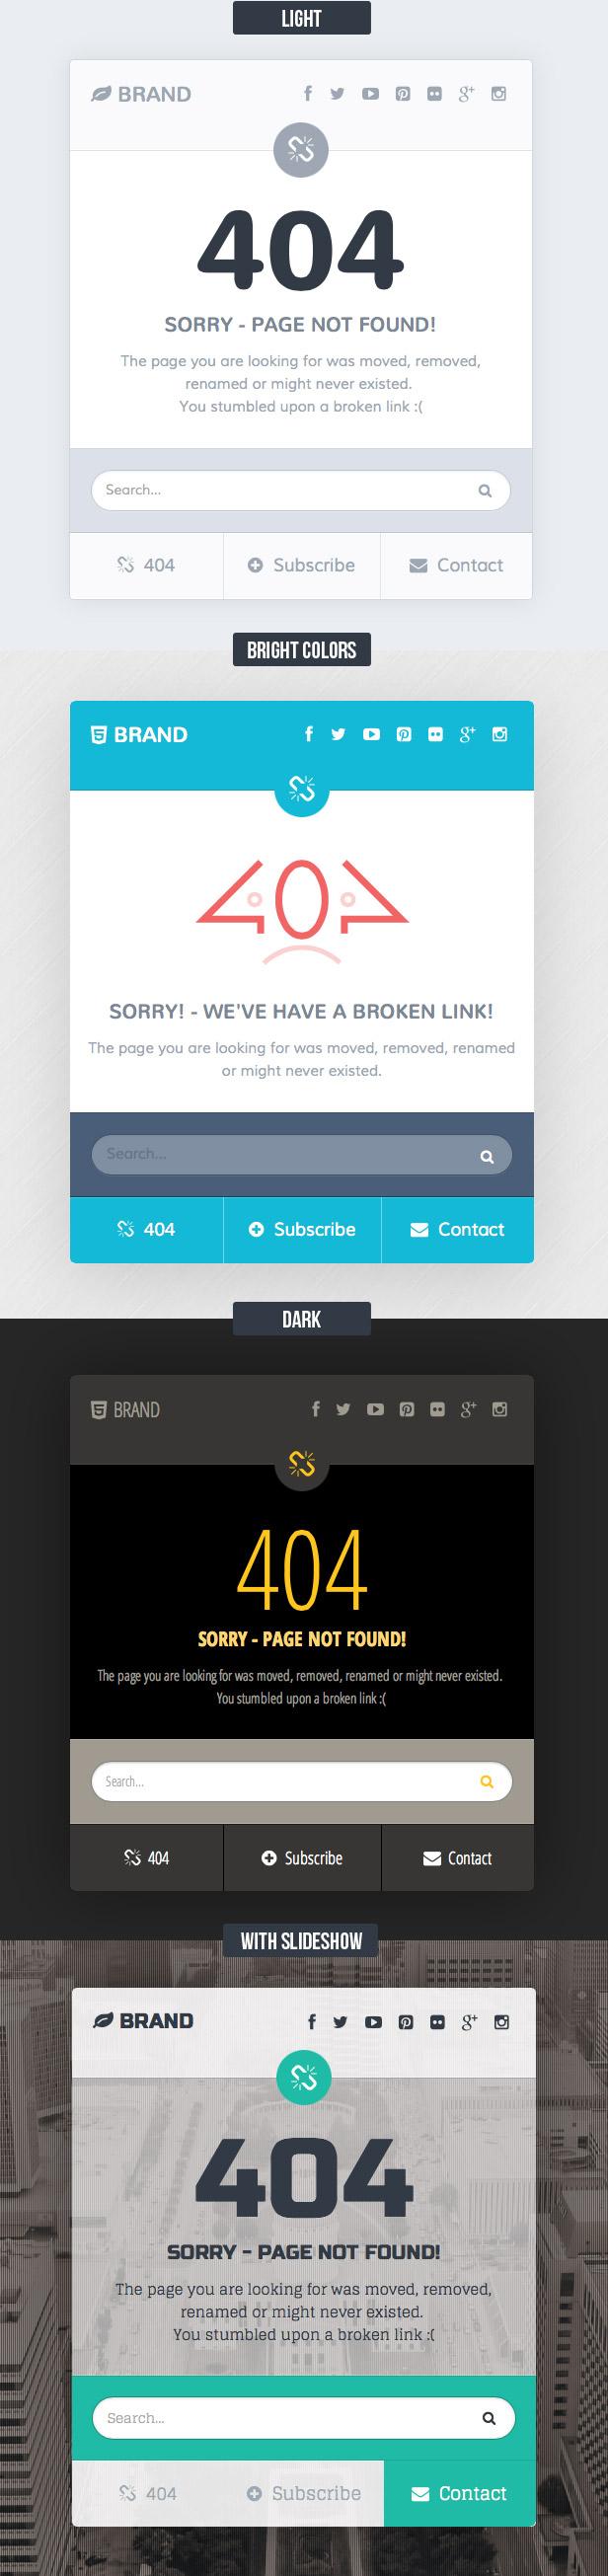 Missing - 404 Responsive Page Template by Saptarang